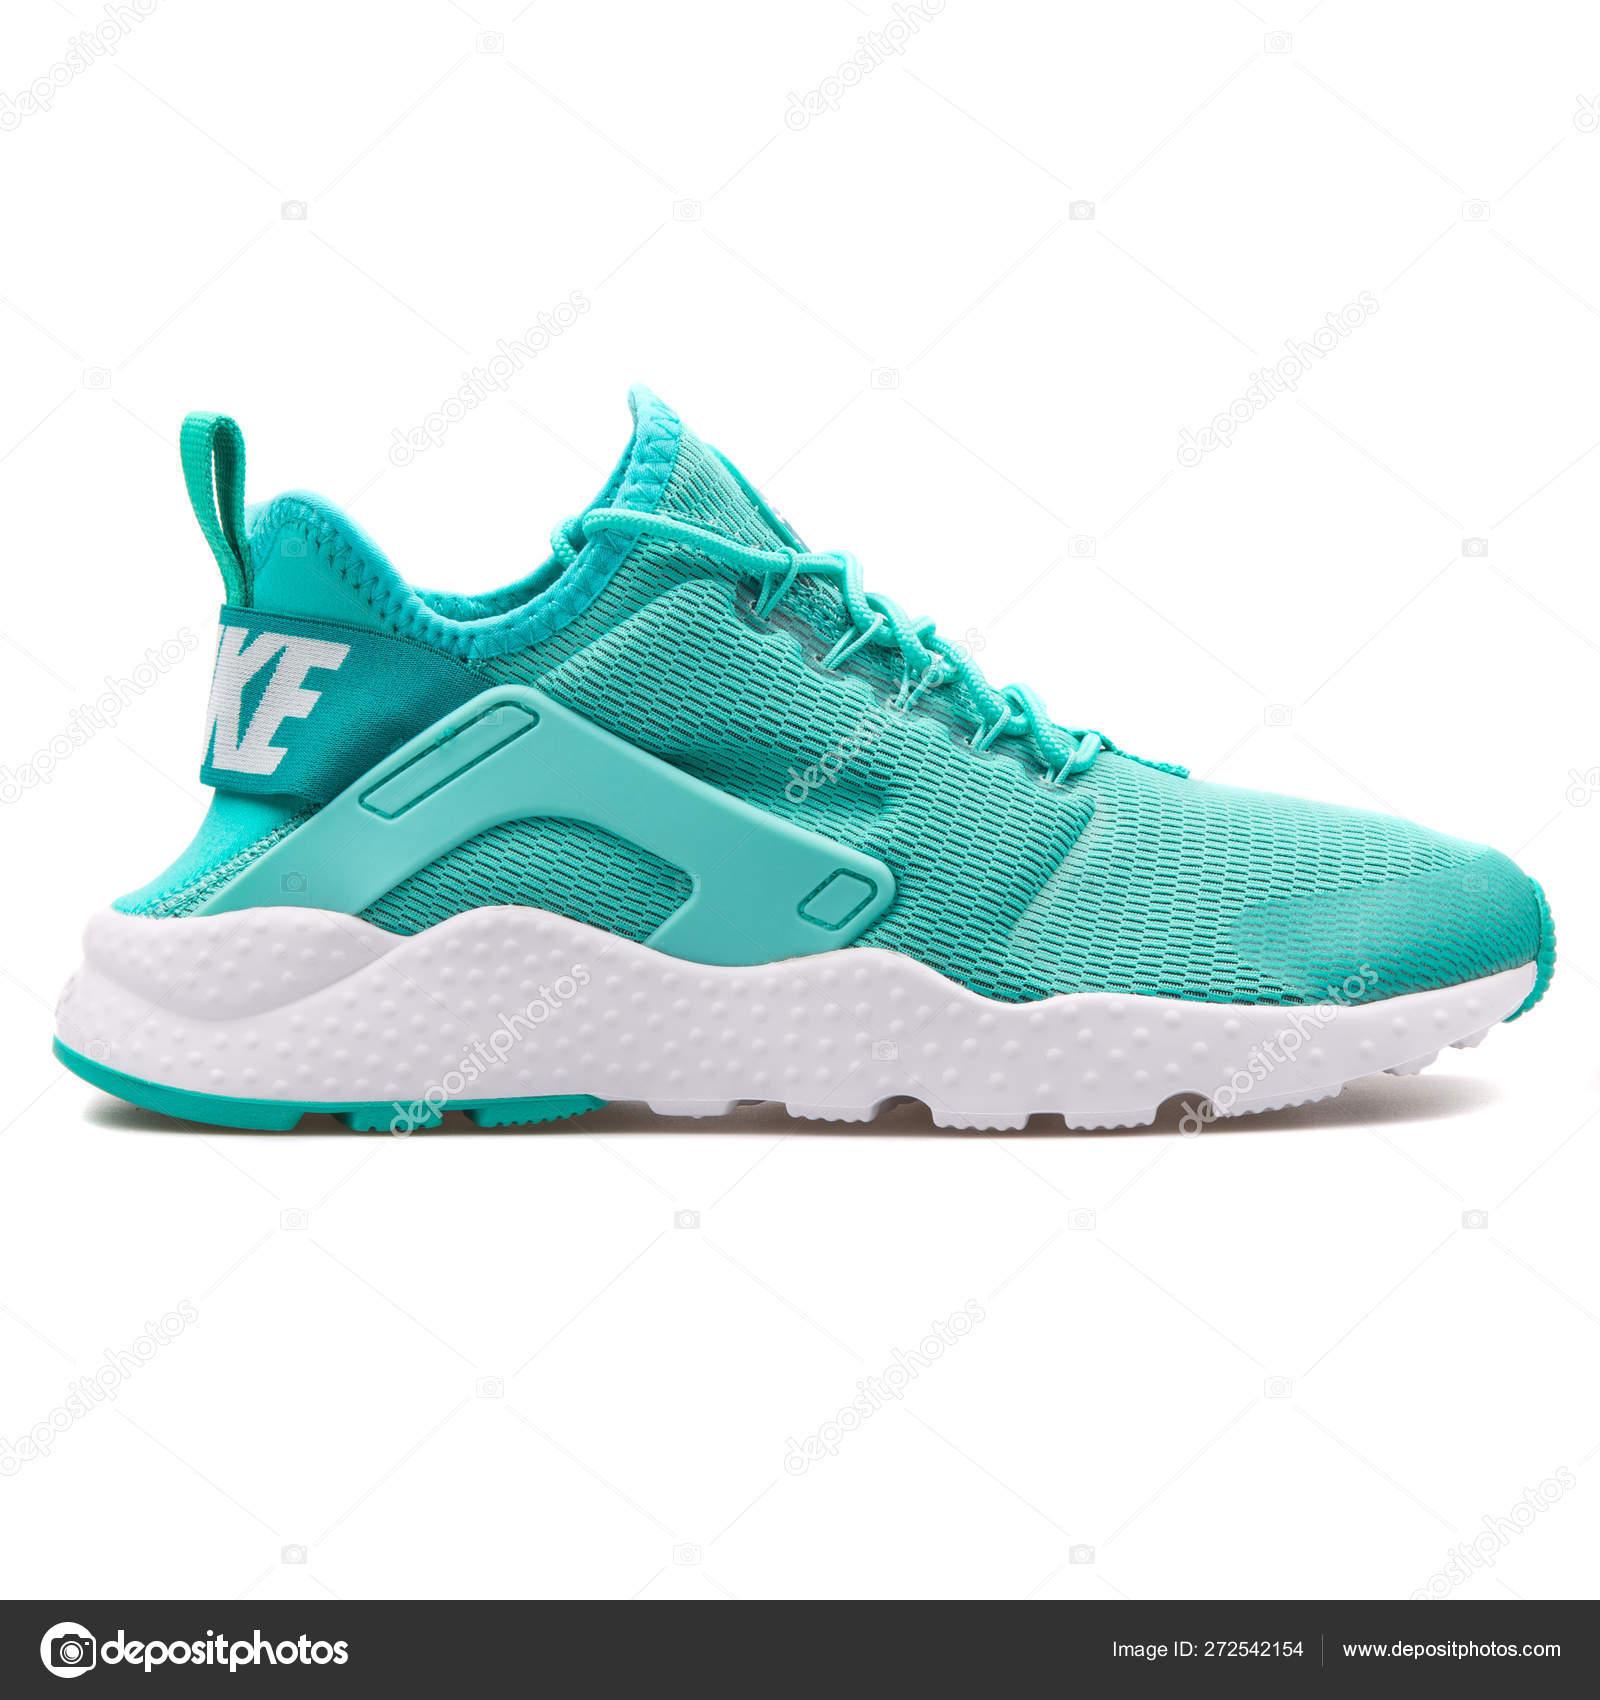 Nike Air Huarache Run Ultra turquoise